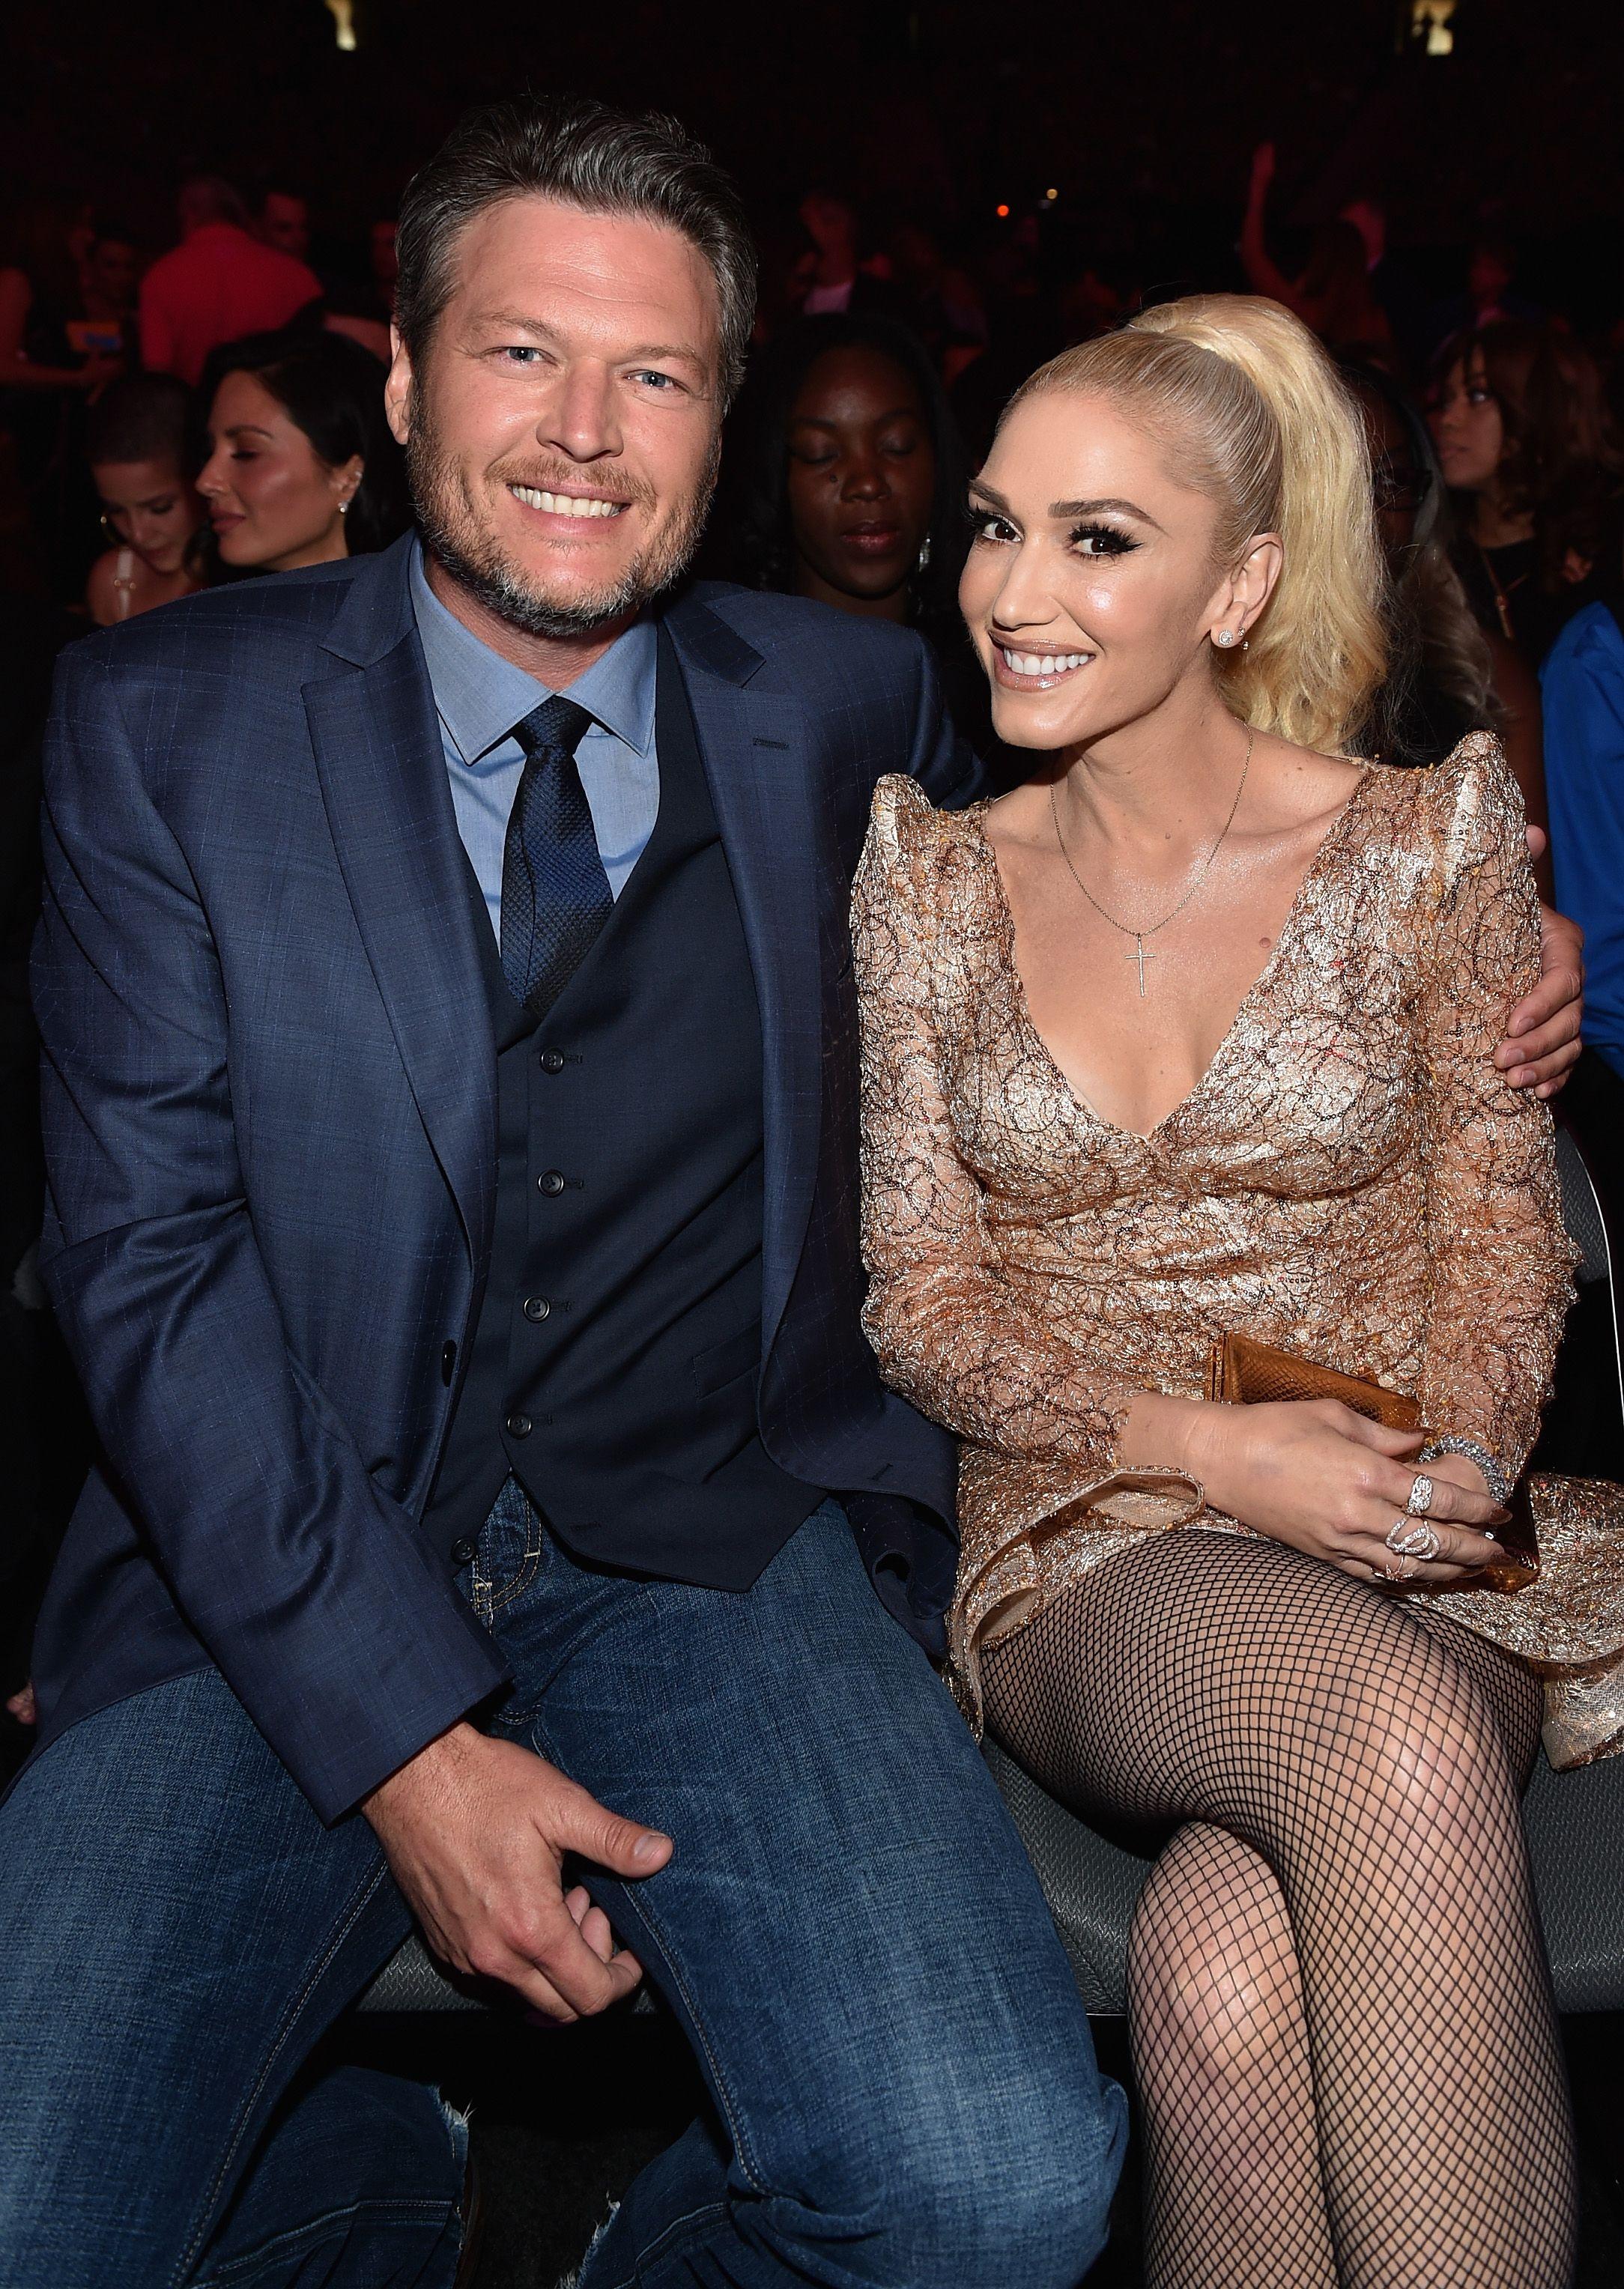 WHO  s dating Gwen Stefani